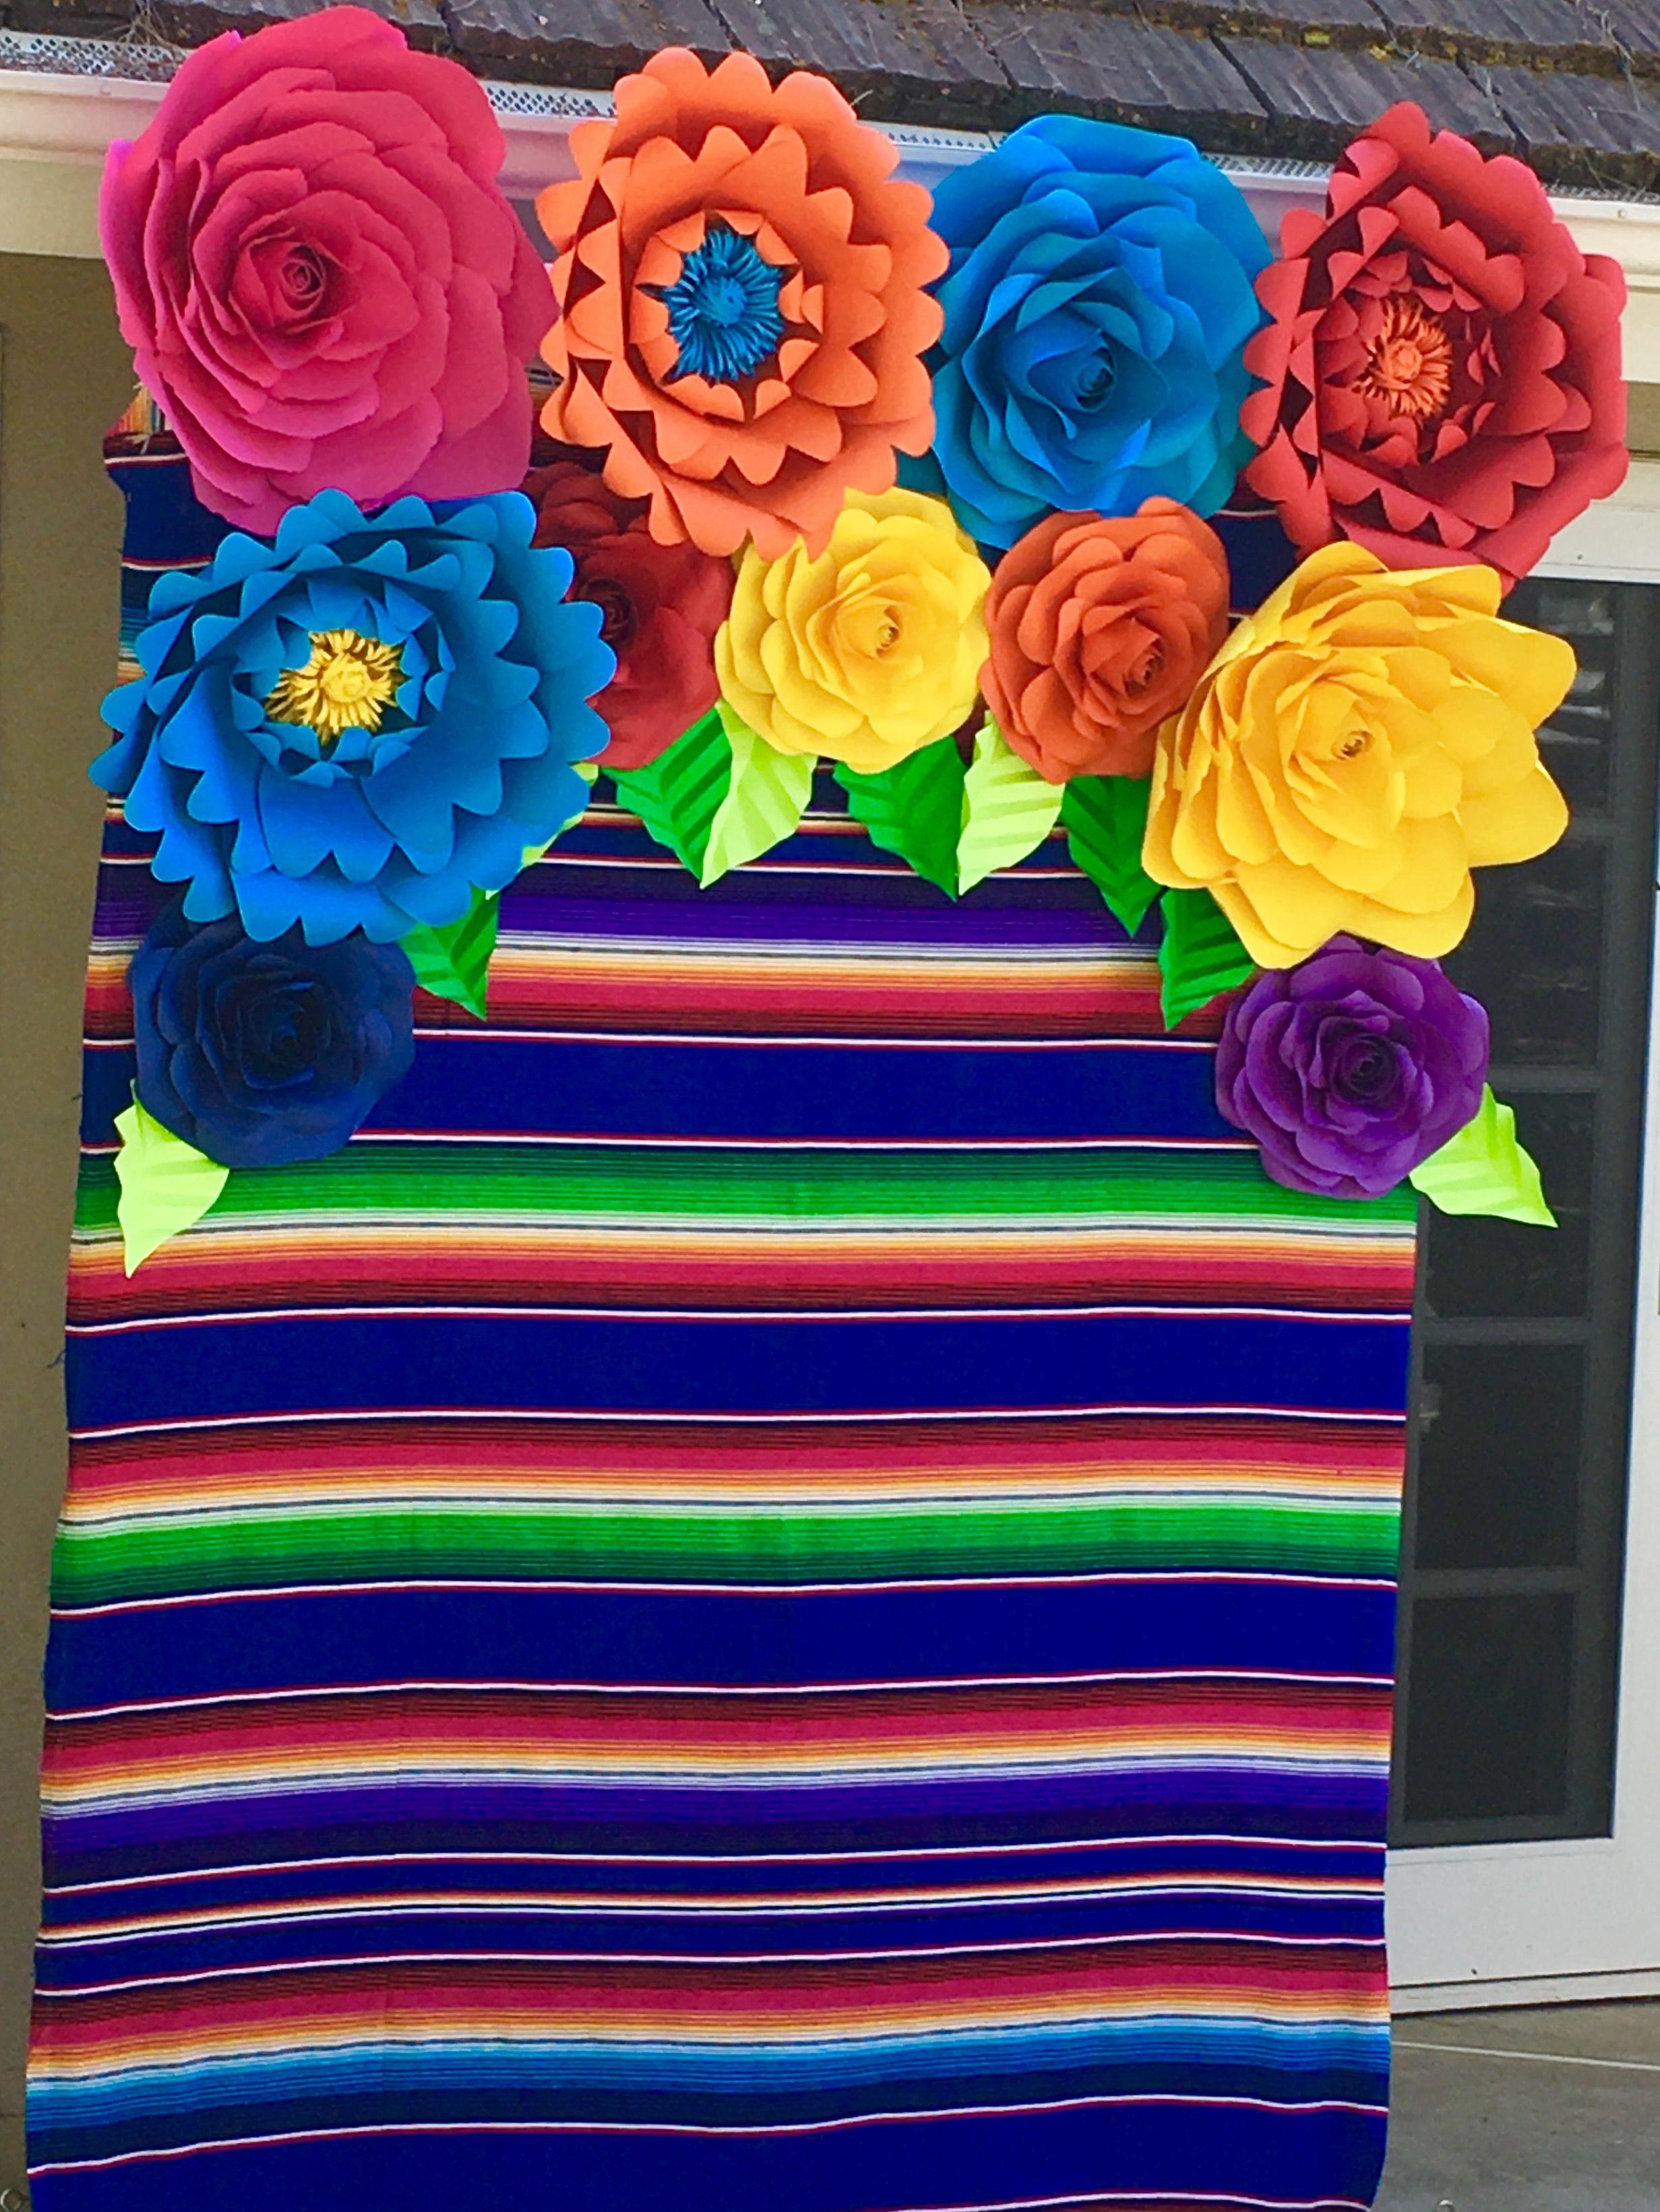 Instagram craftsbybetty mexican fiesta photo opt backdrop paper instagram craftsbybetty mexican fiesta photo opt backdrop paper flowers paper craft mightylinksfo